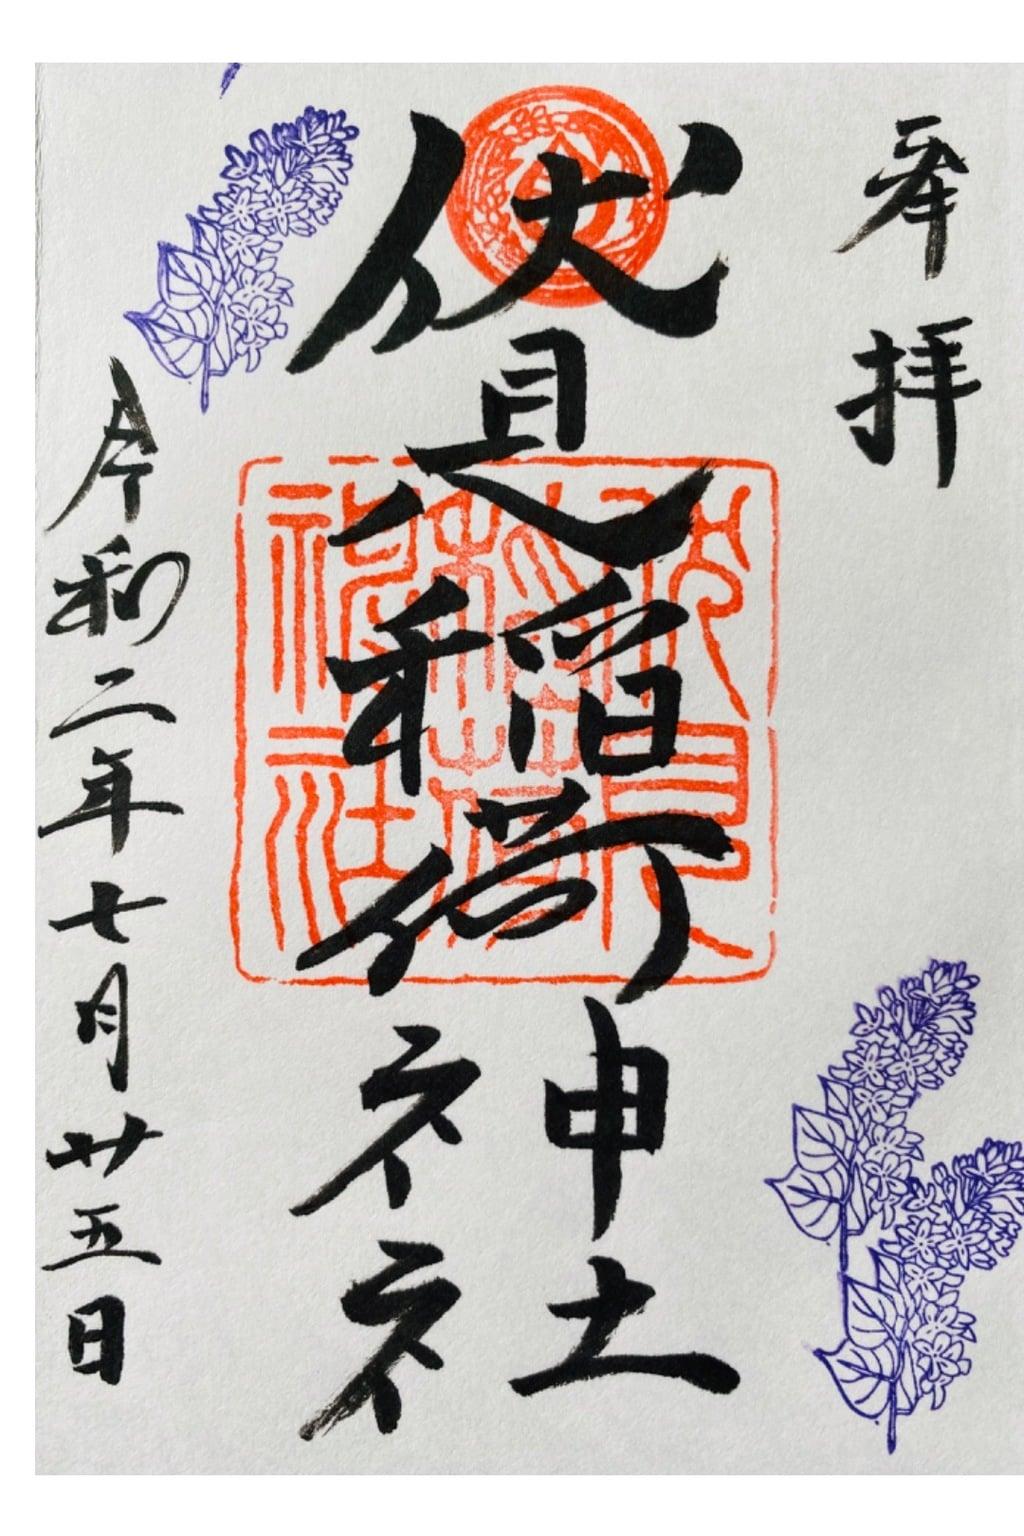 札幌伏見稲荷神社の御朱印